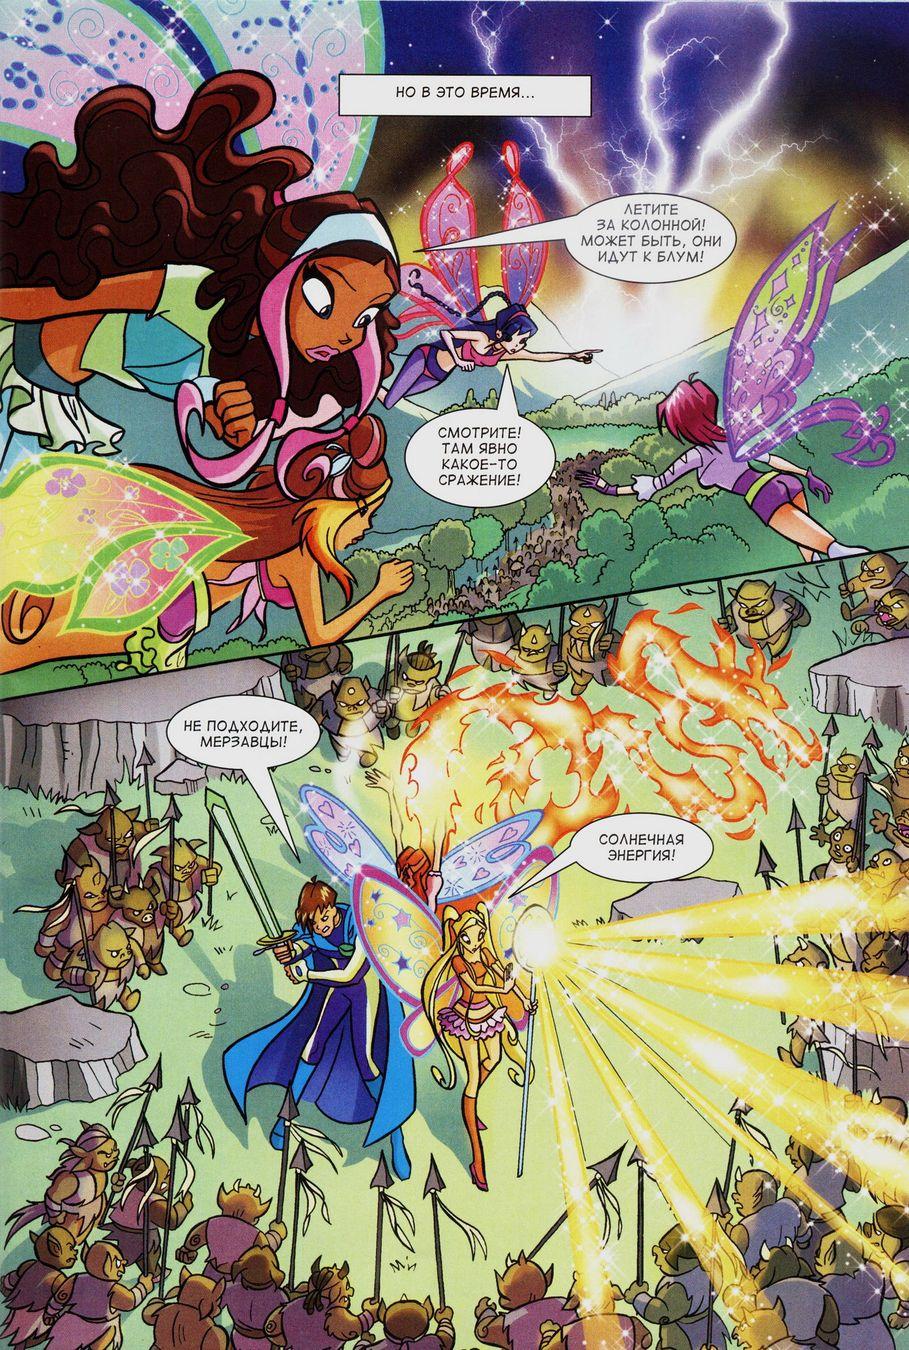 Комикс Винкс Winx - Волшебник Камуд (Журнал Винкс №6 2011) - стр. 55